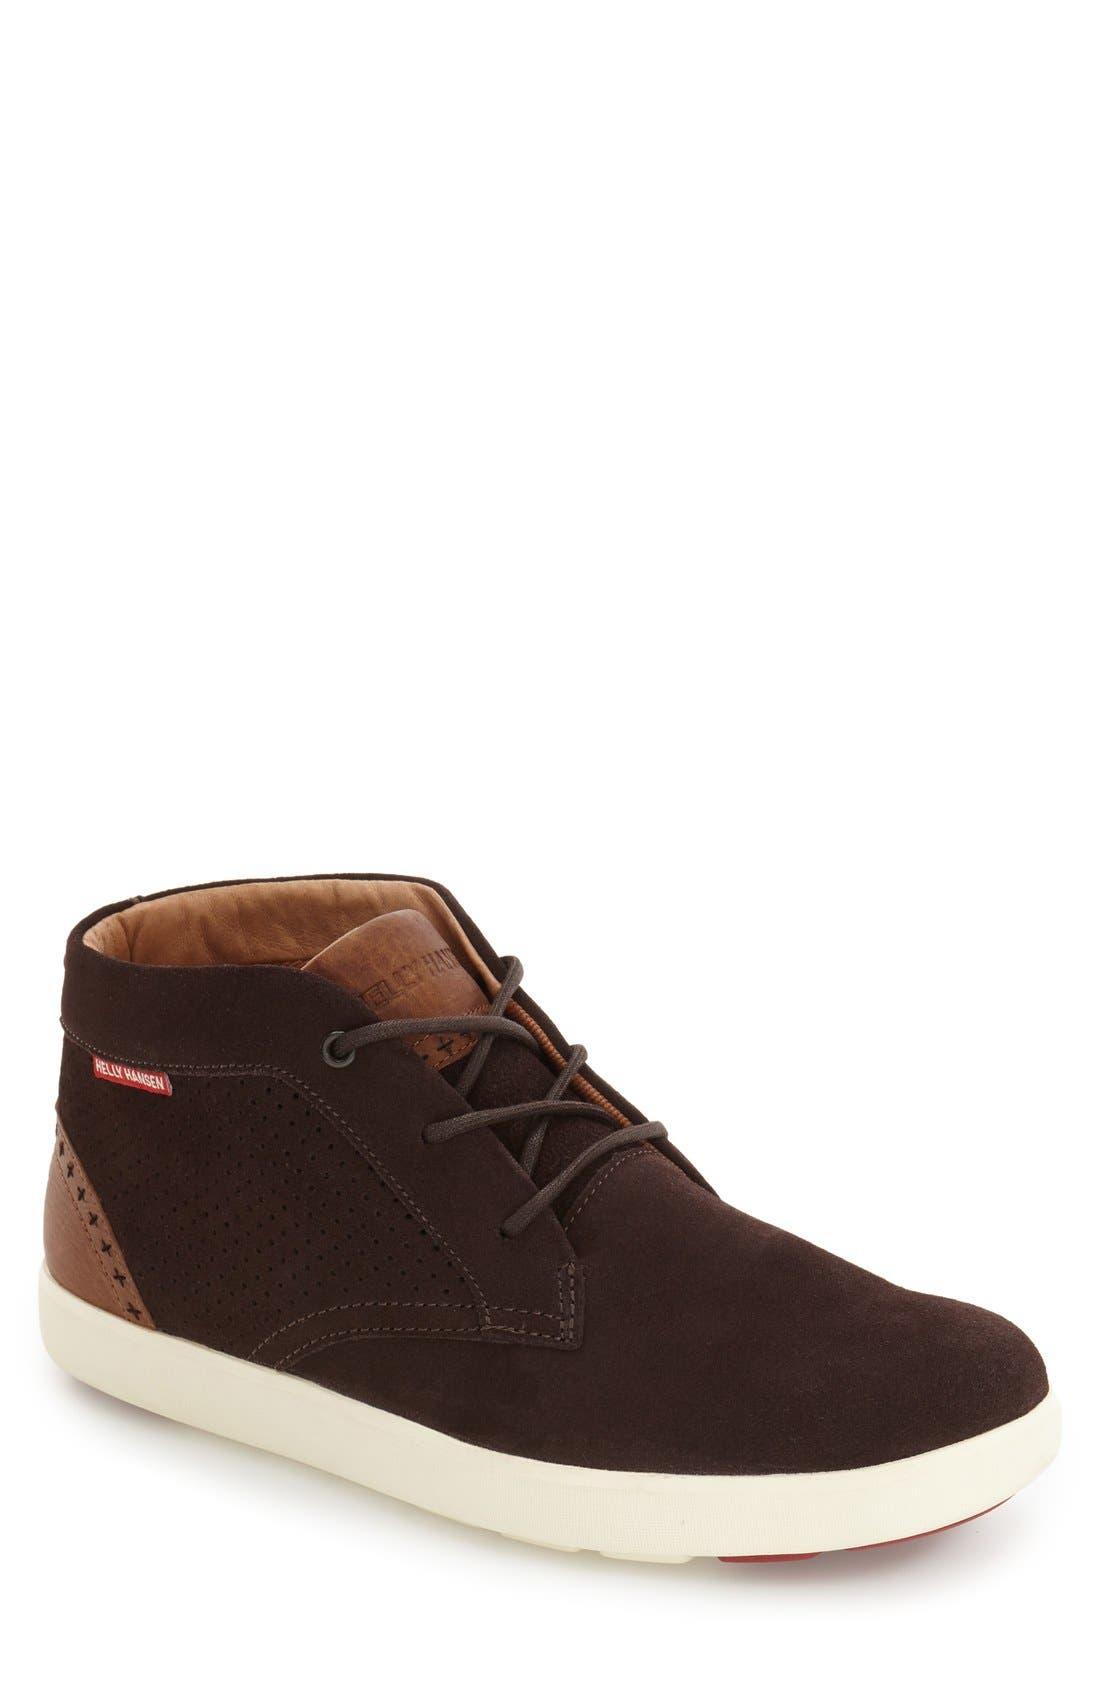 Main Image - Helly Hansen 'Vigeland' Sneaker (Men)